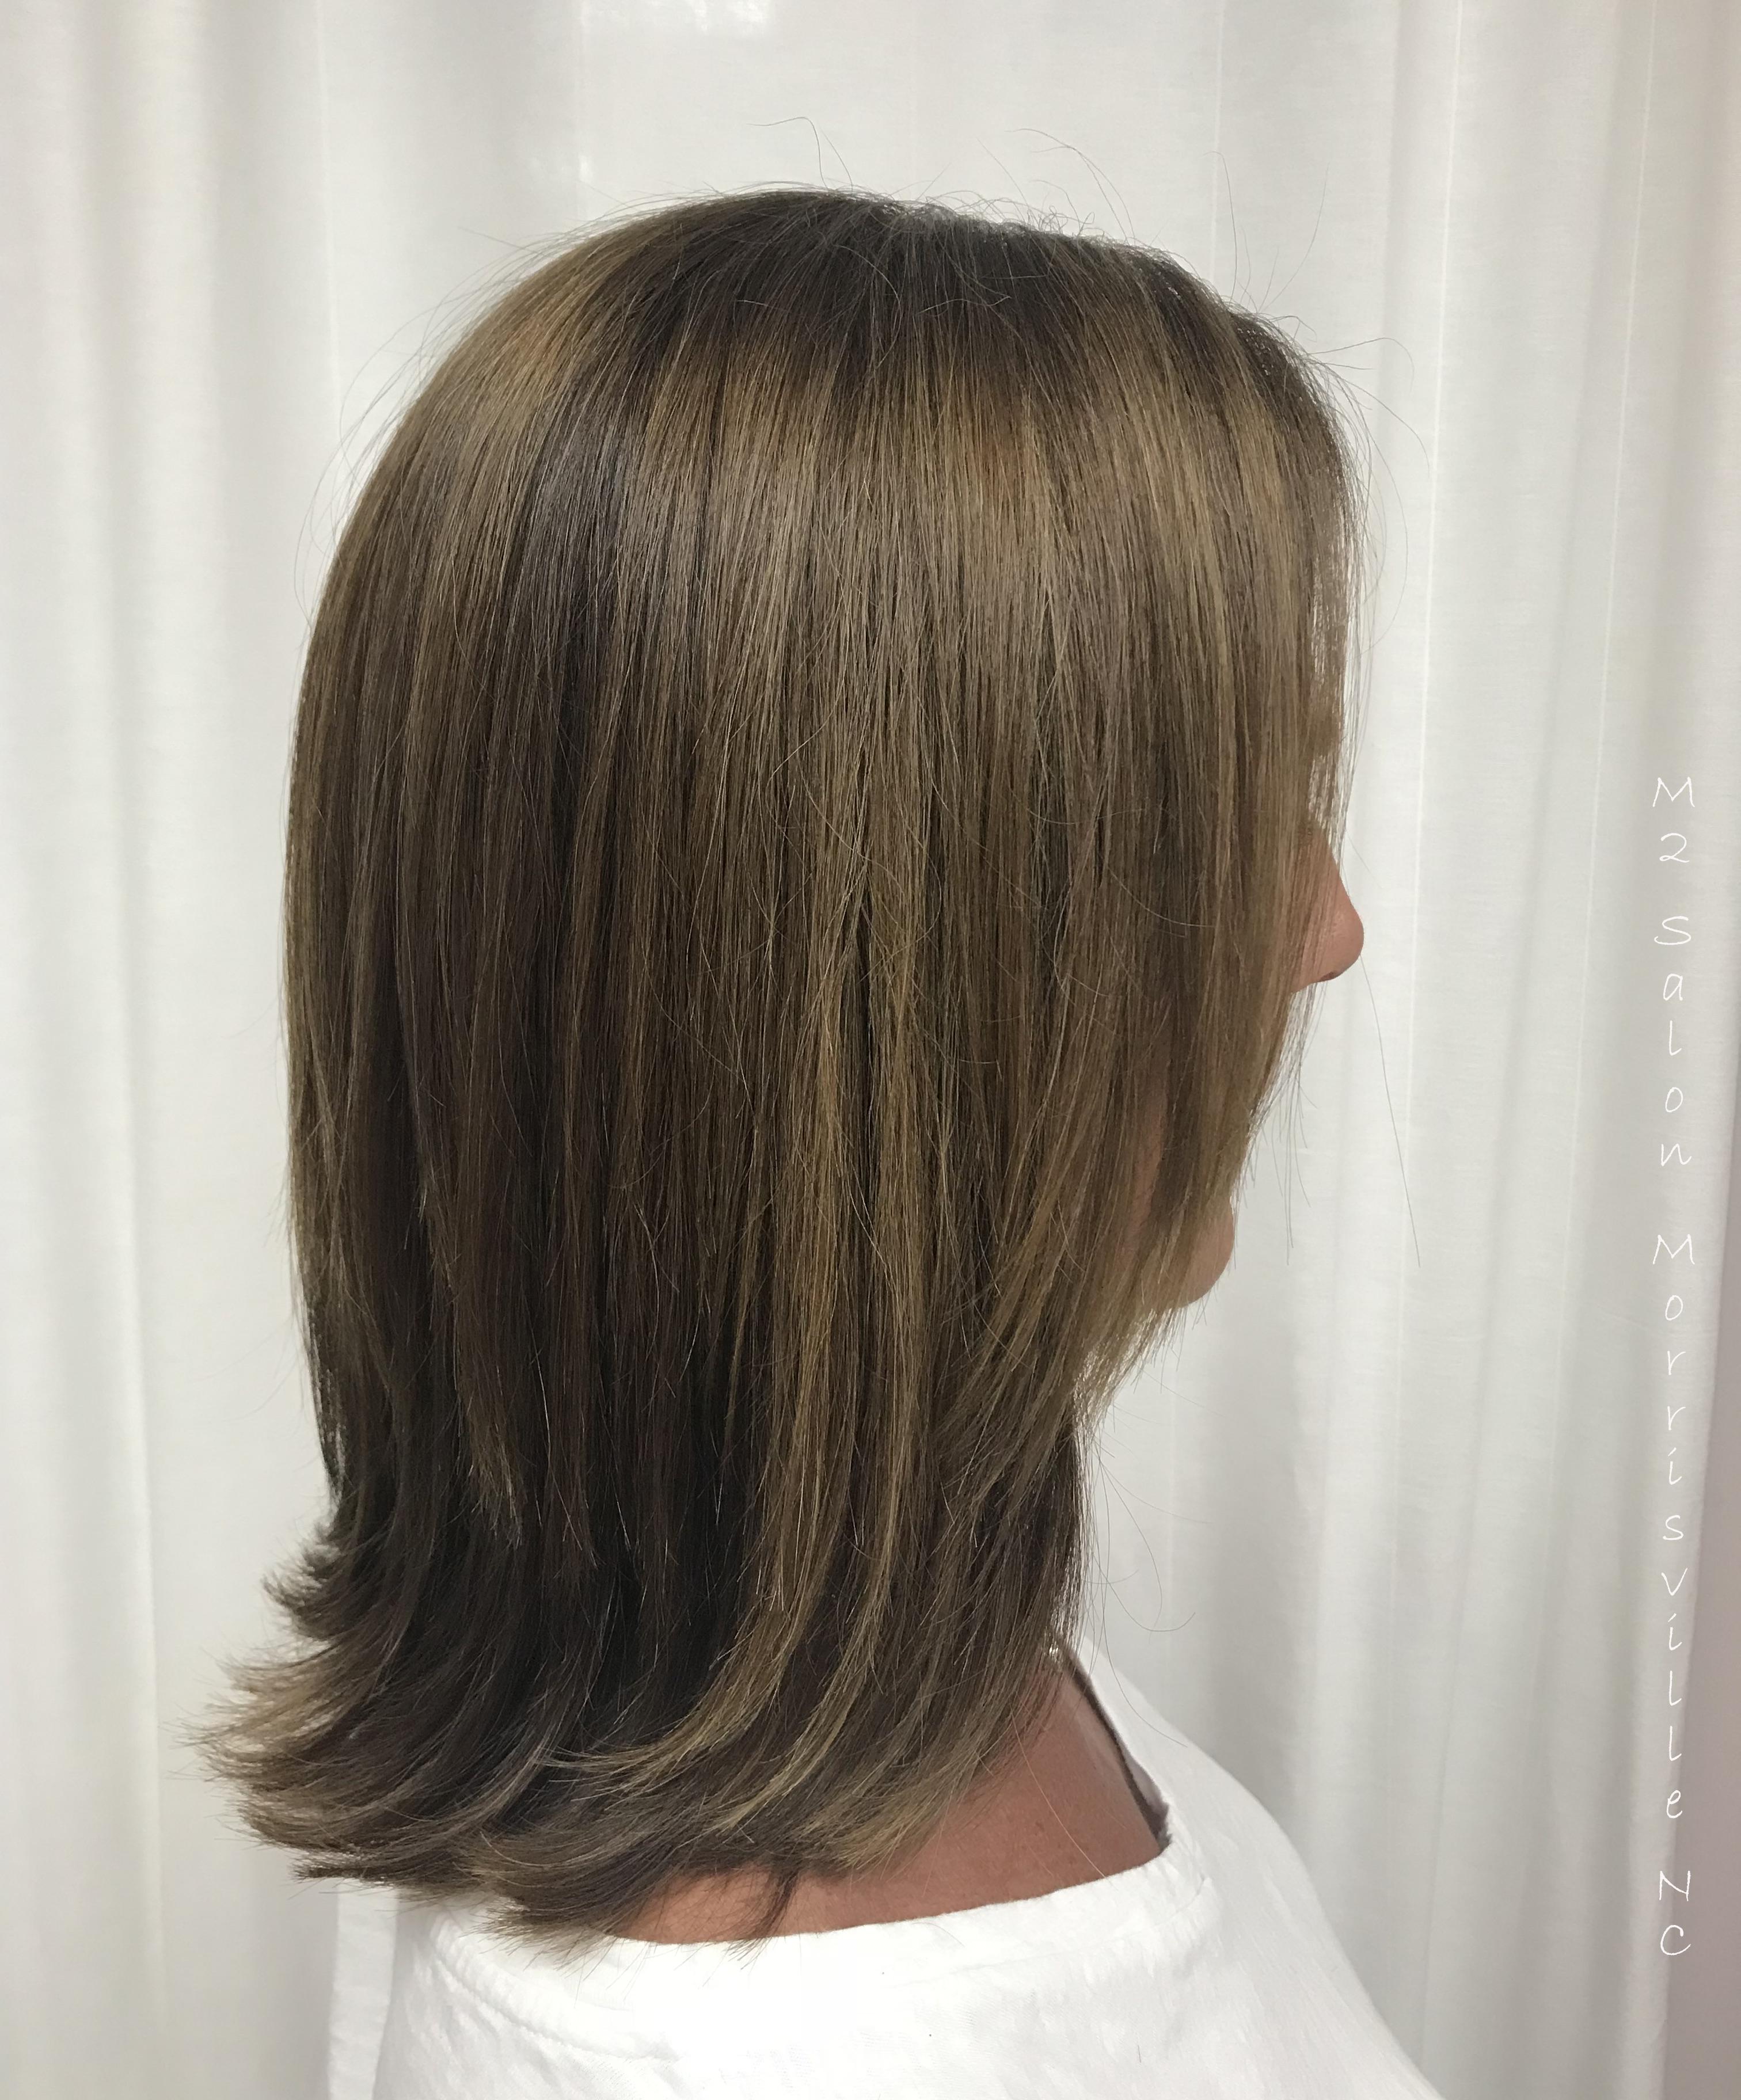 Keratin Treatment And Fall Hair Color M2 Salon Nc At Sola Salon